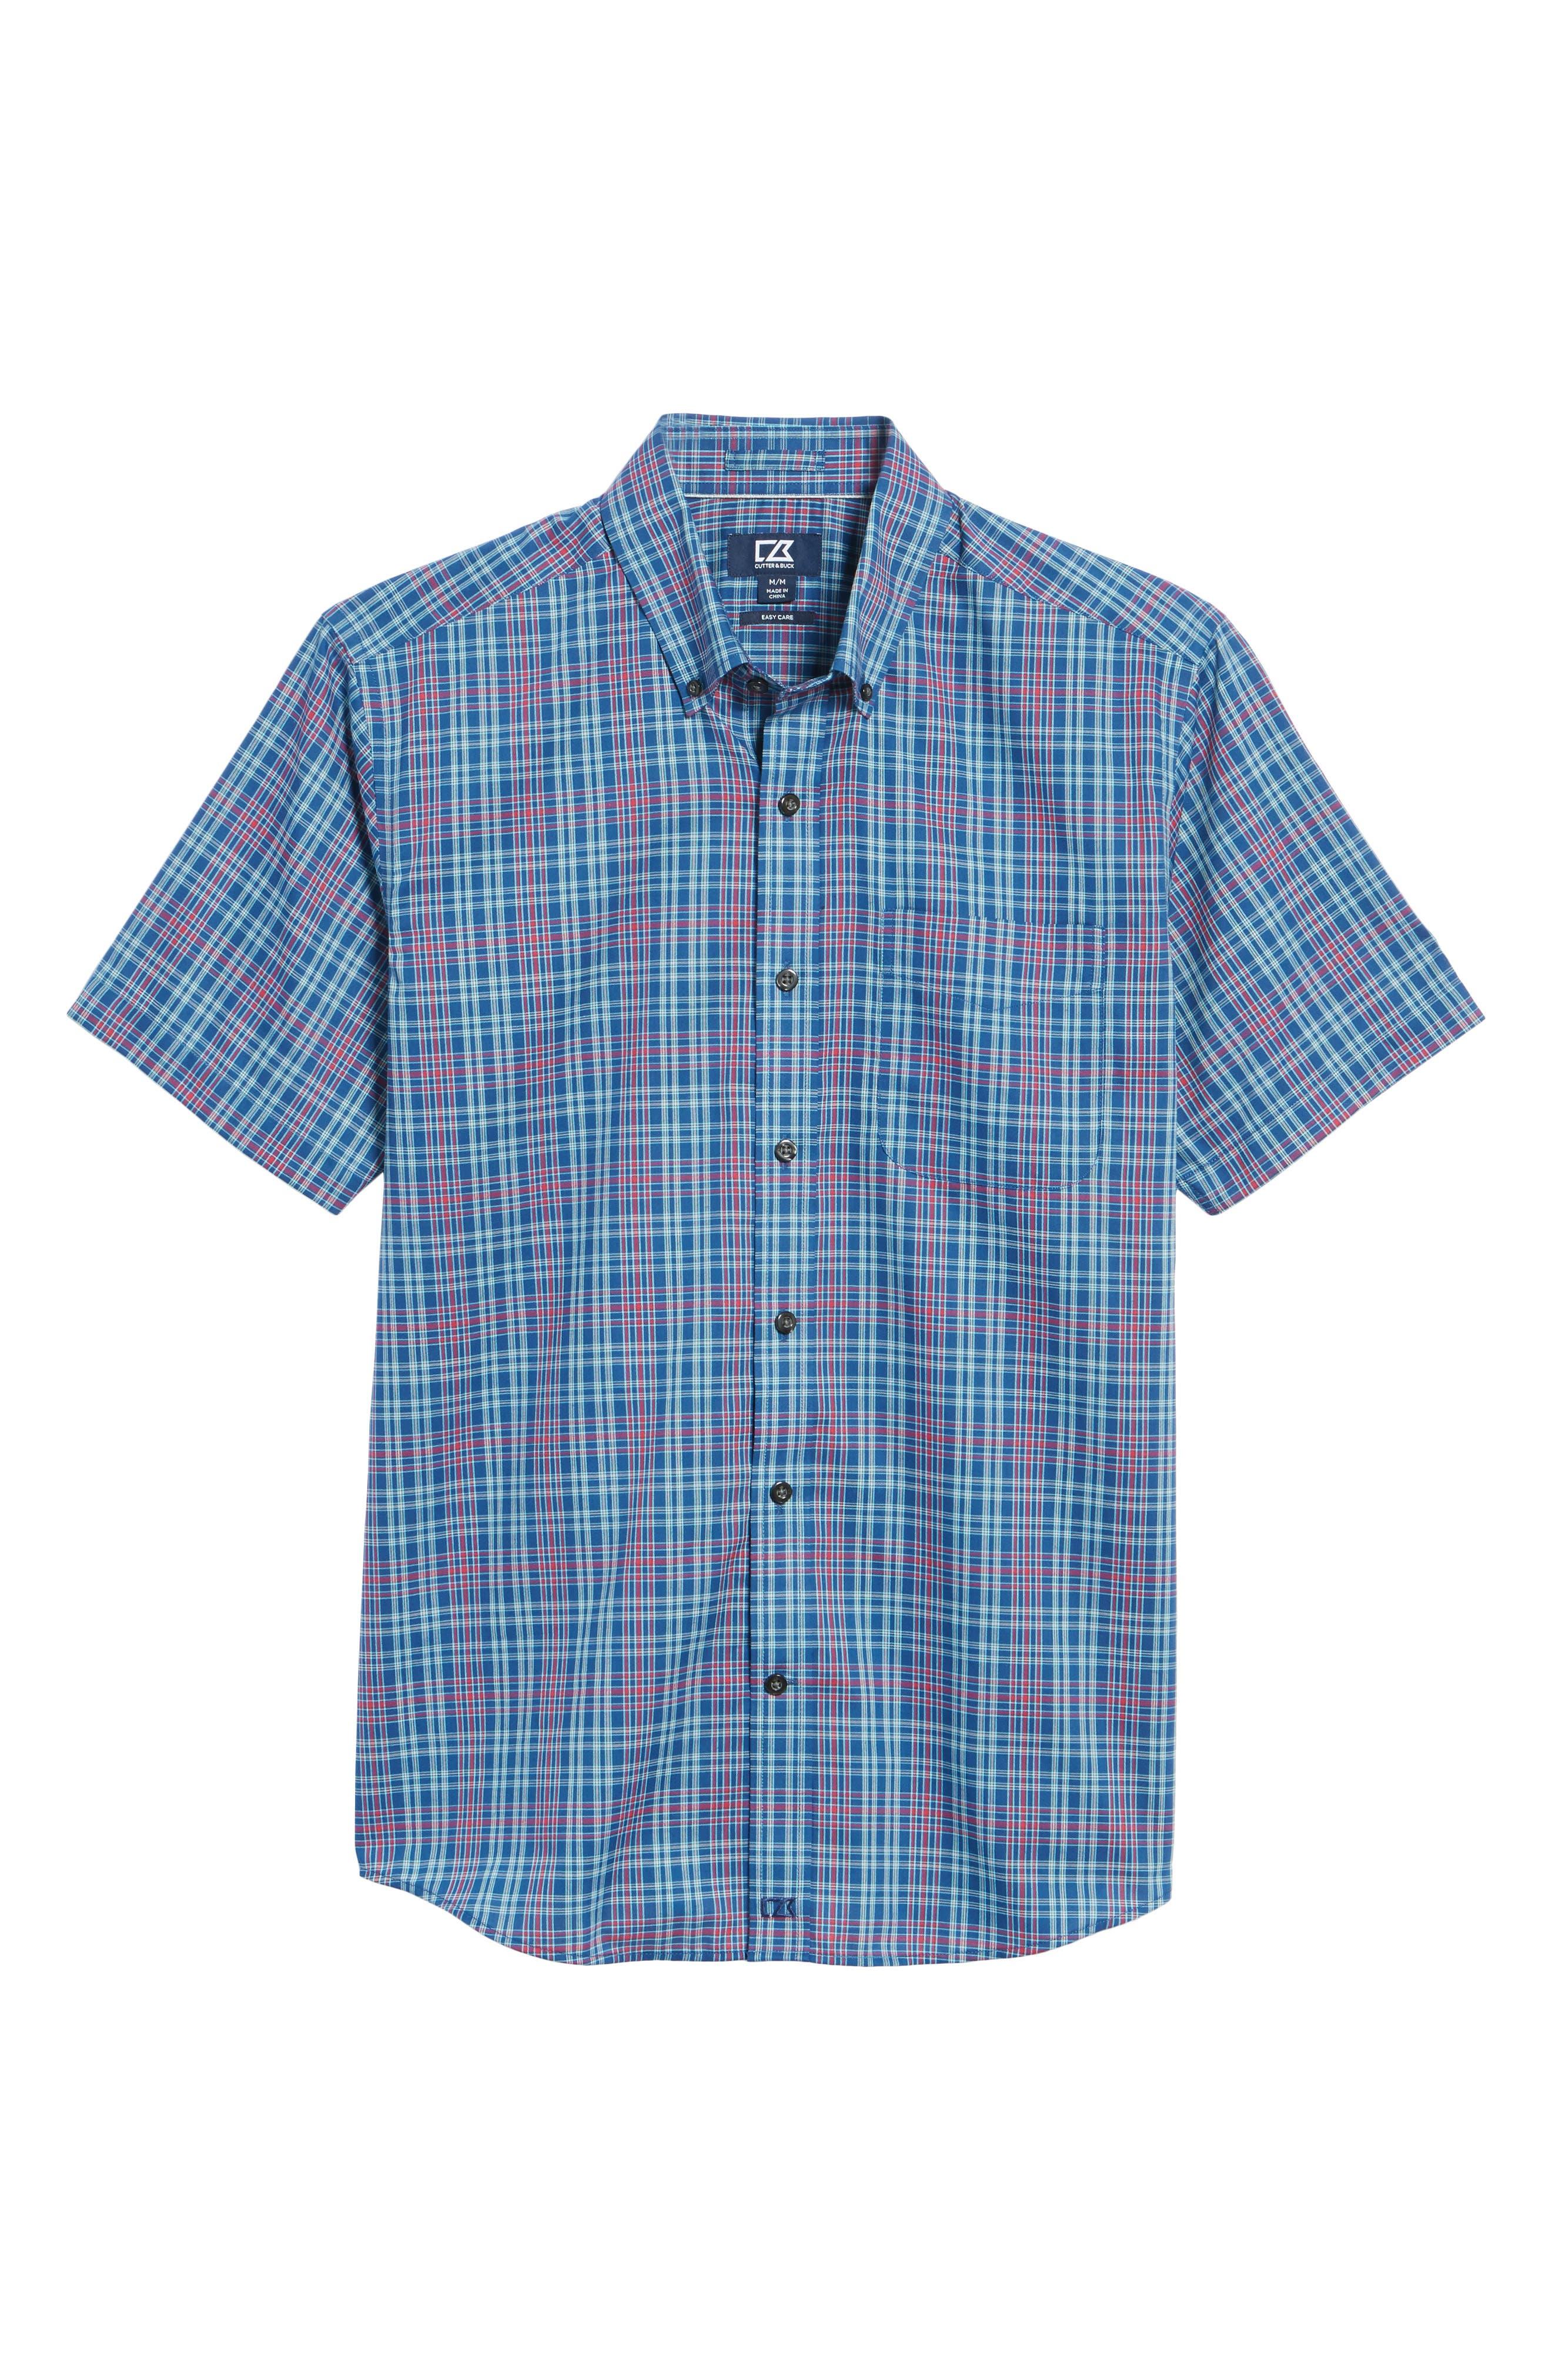 Isaac Plaid Easy Care Woven Shirt,                             Alternate thumbnail 23, color,